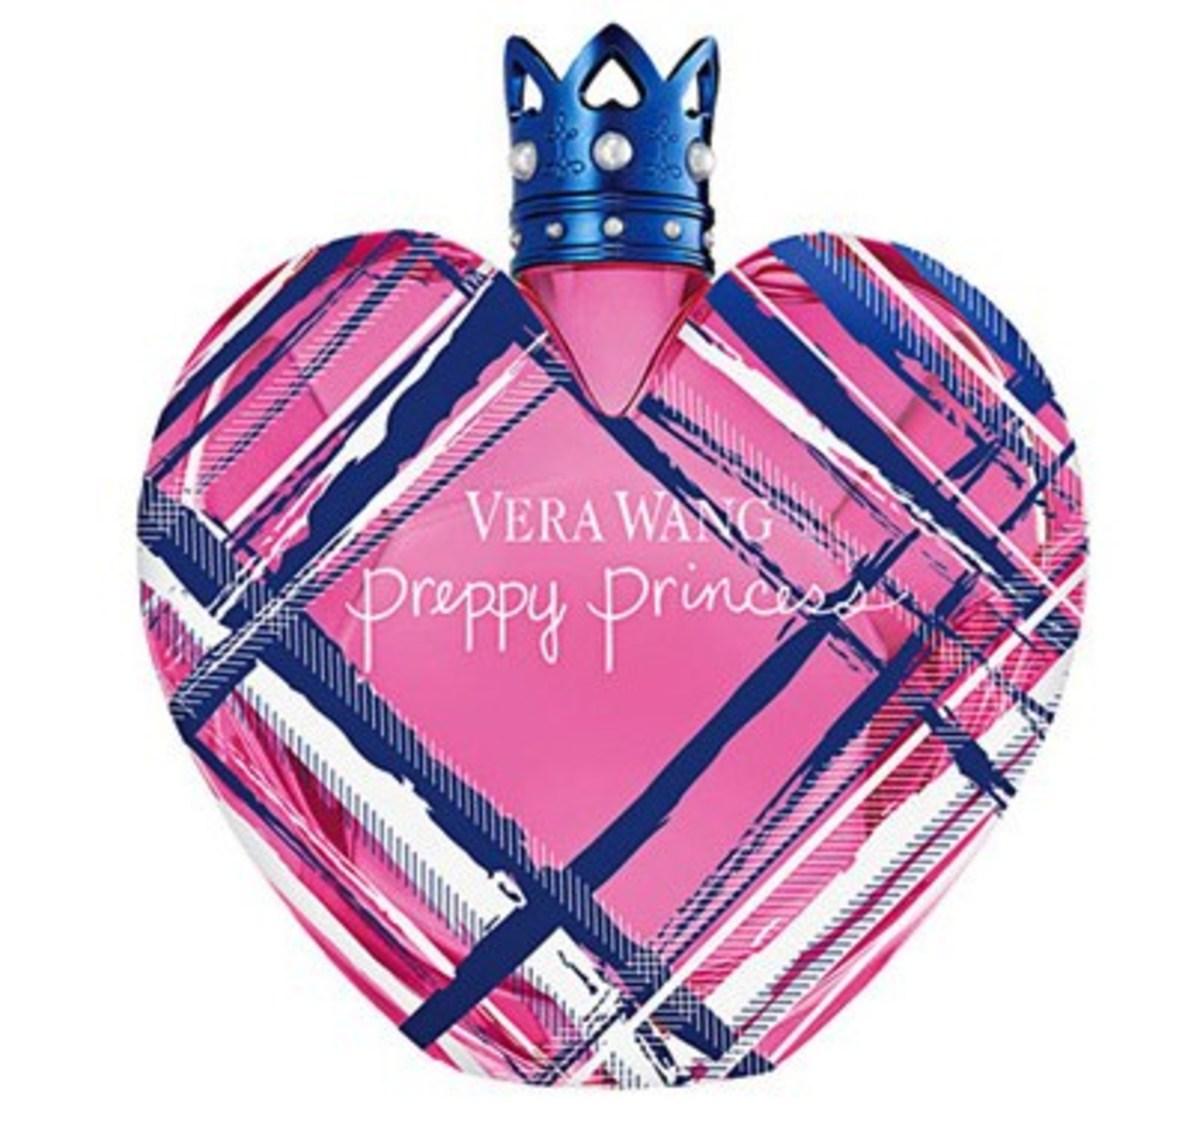 Vera-Wang-Preppy-Princess